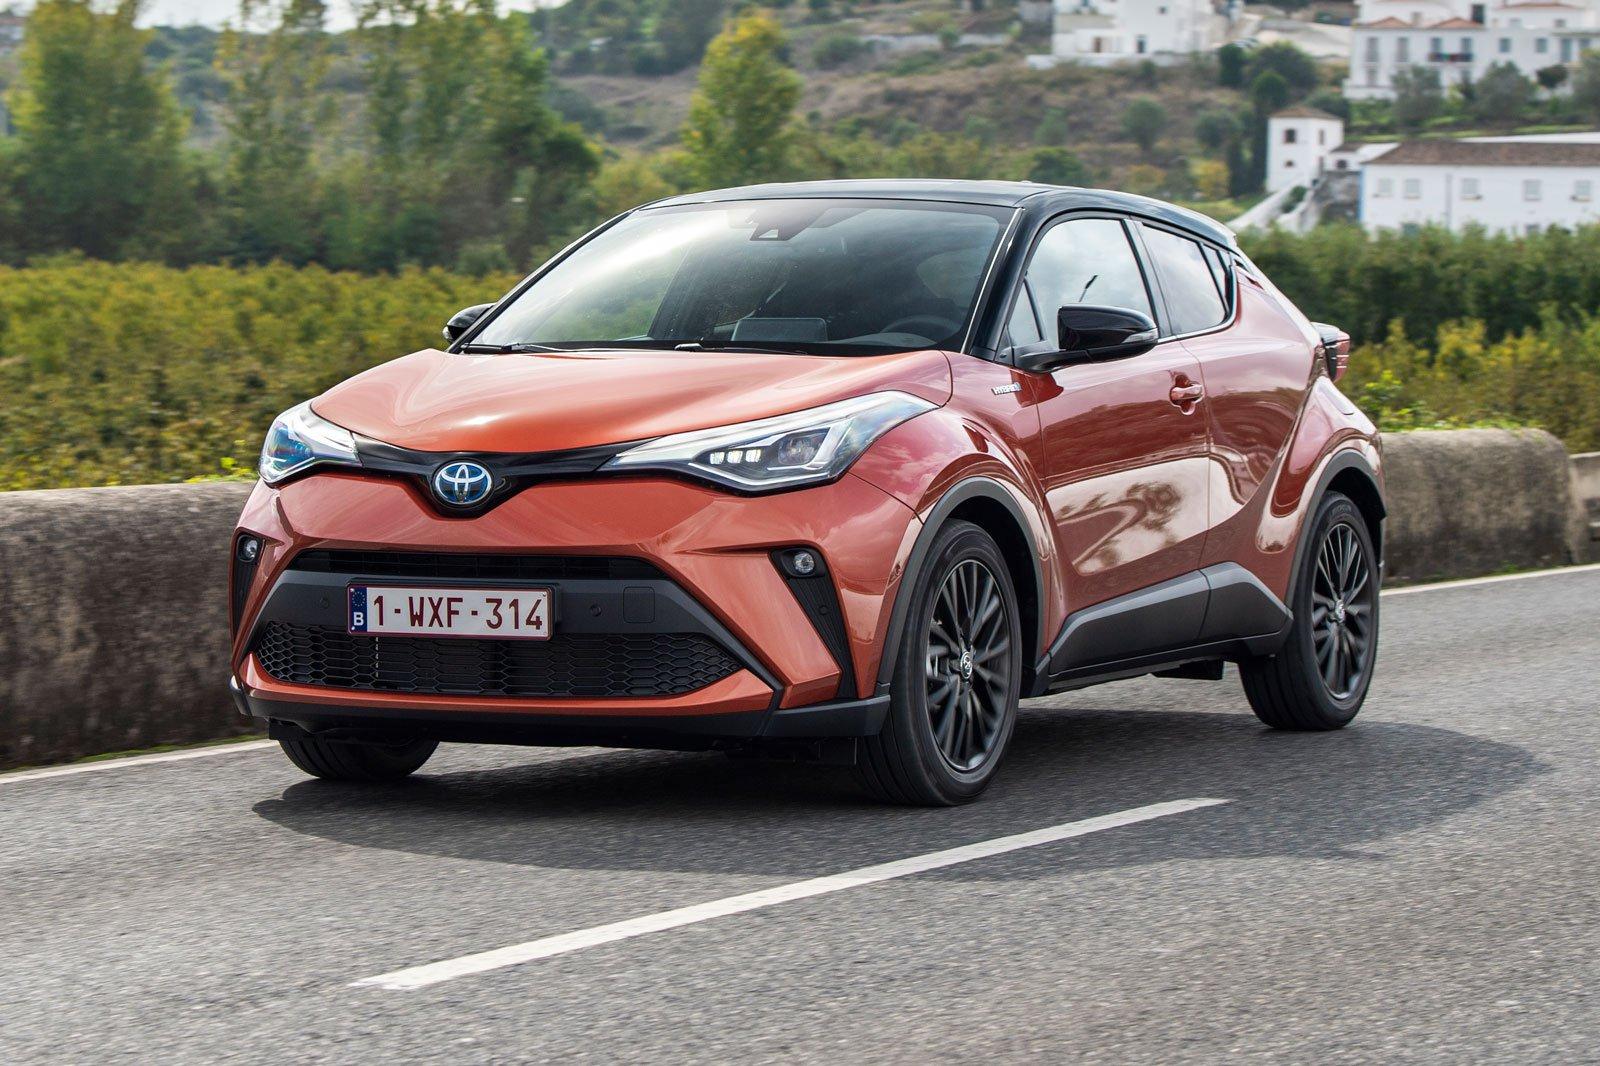 2020 toyota c-hr orange driving front